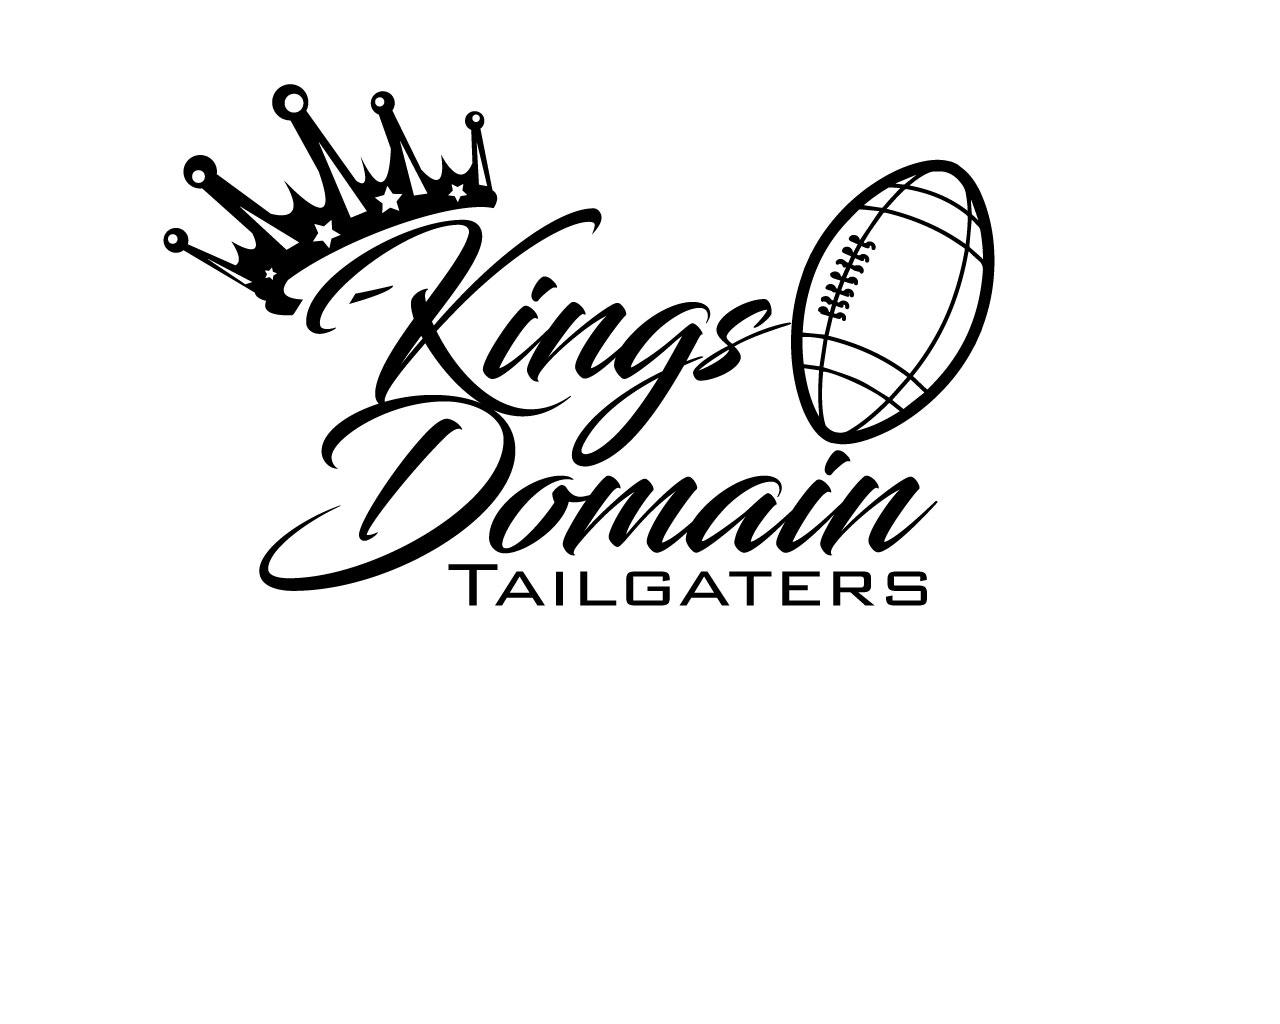 Kings-Domain-tailgaters